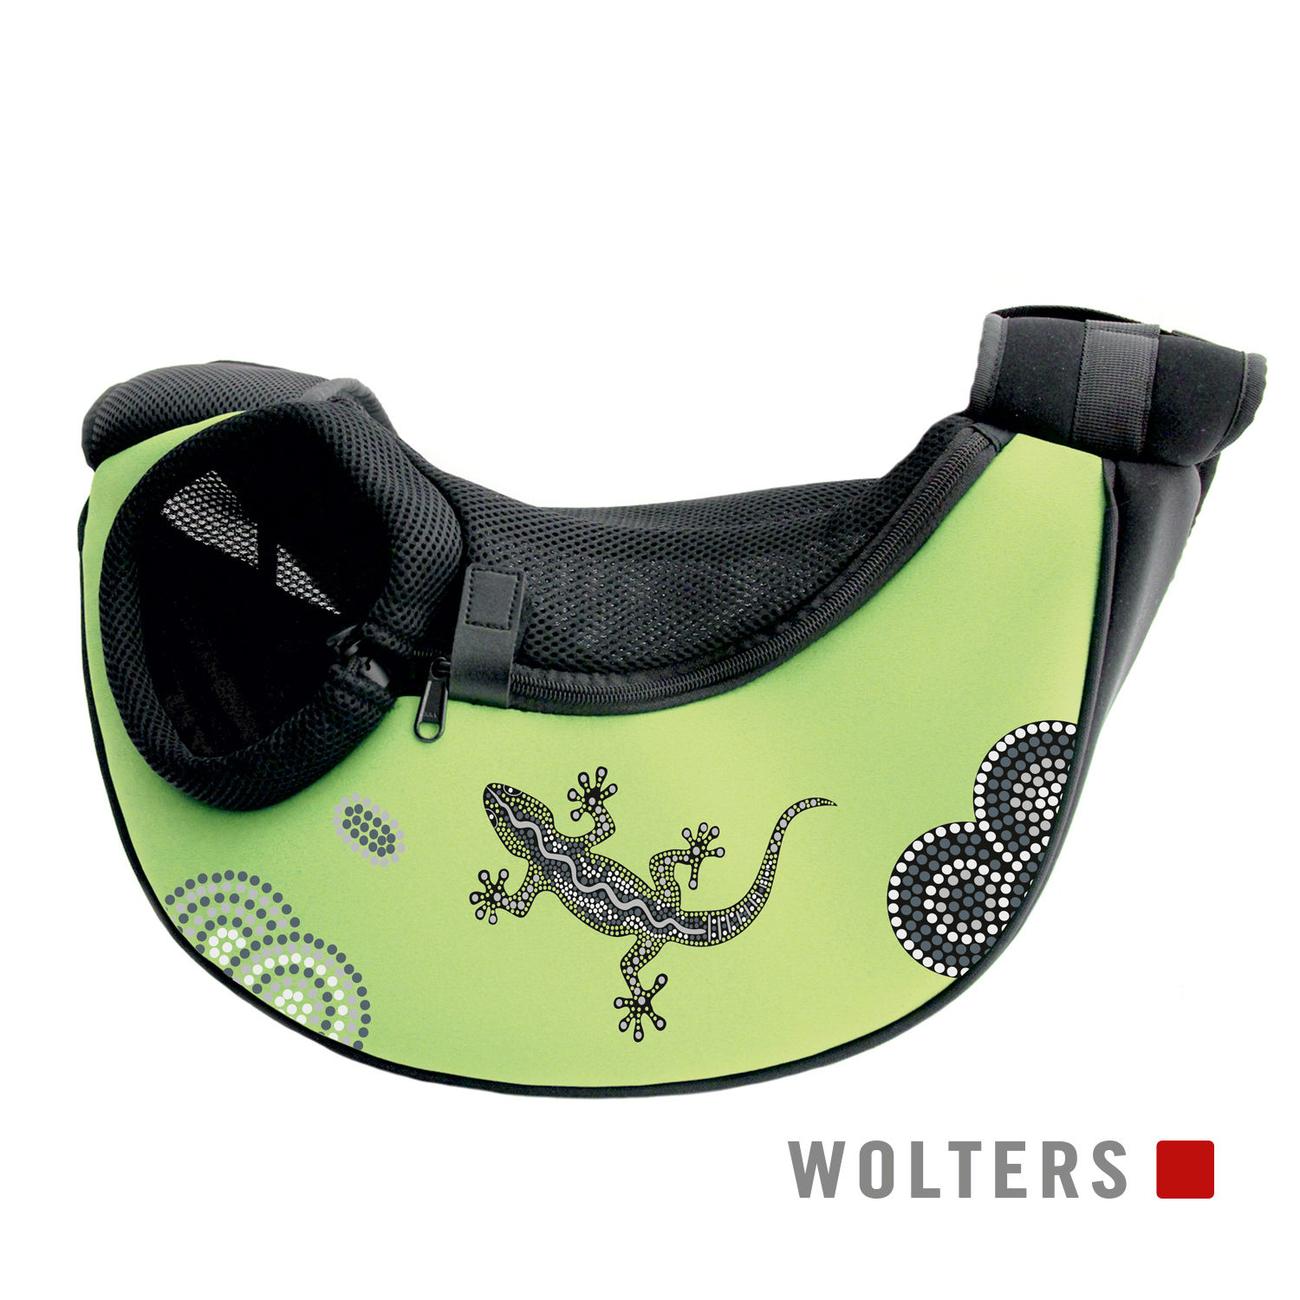 Wolters Bodypack Sunset Hundetasche, Bild 7